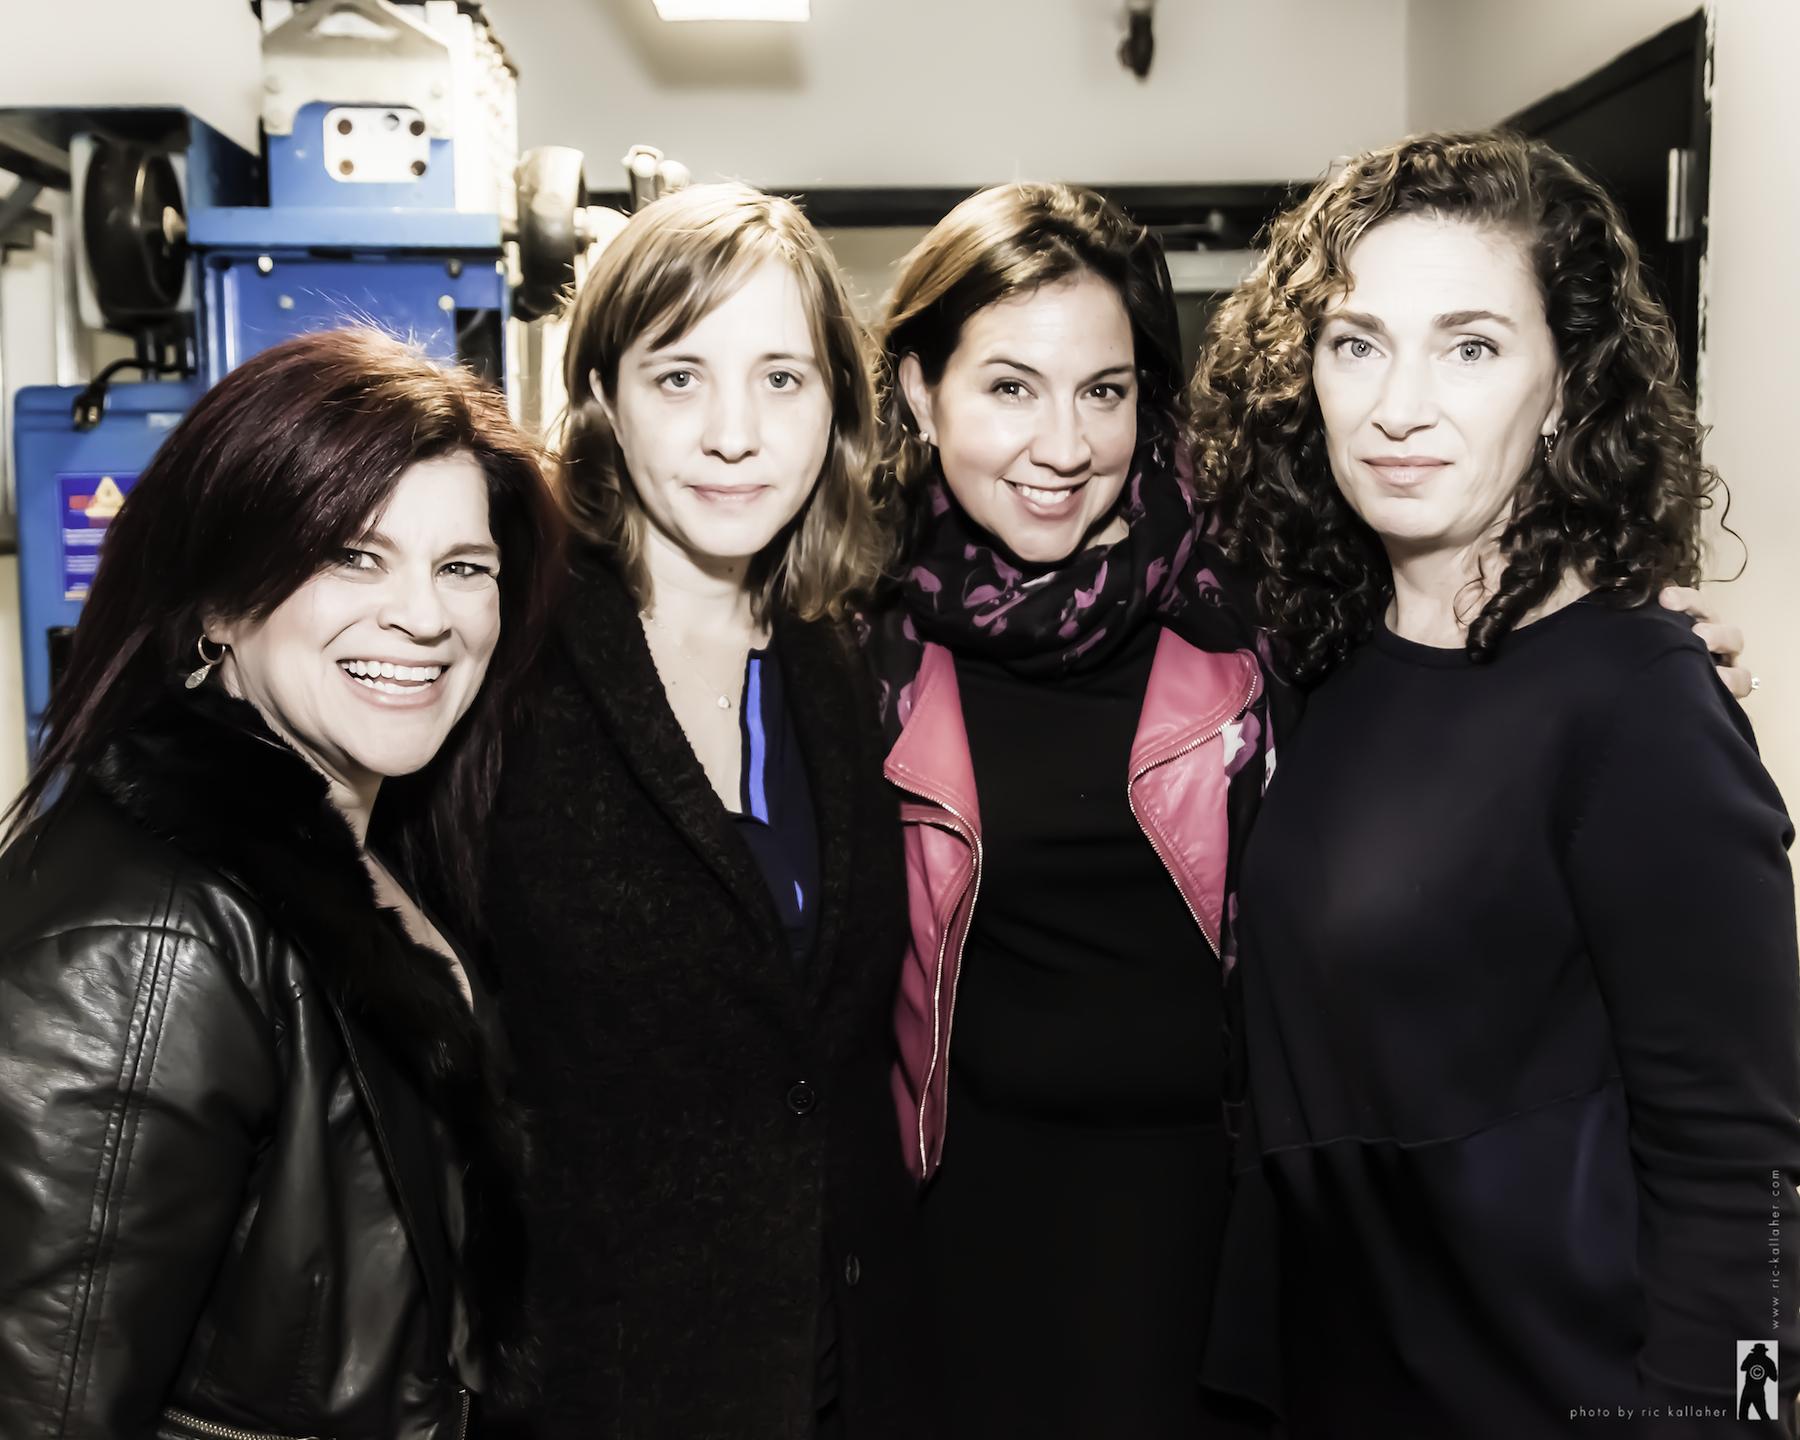 Storyville team at NAMT, Lisa DeSpain (music), Kate Whoriskey (director), Kristen Anderson-Lopez (lyrics), Julia Jordan (book)